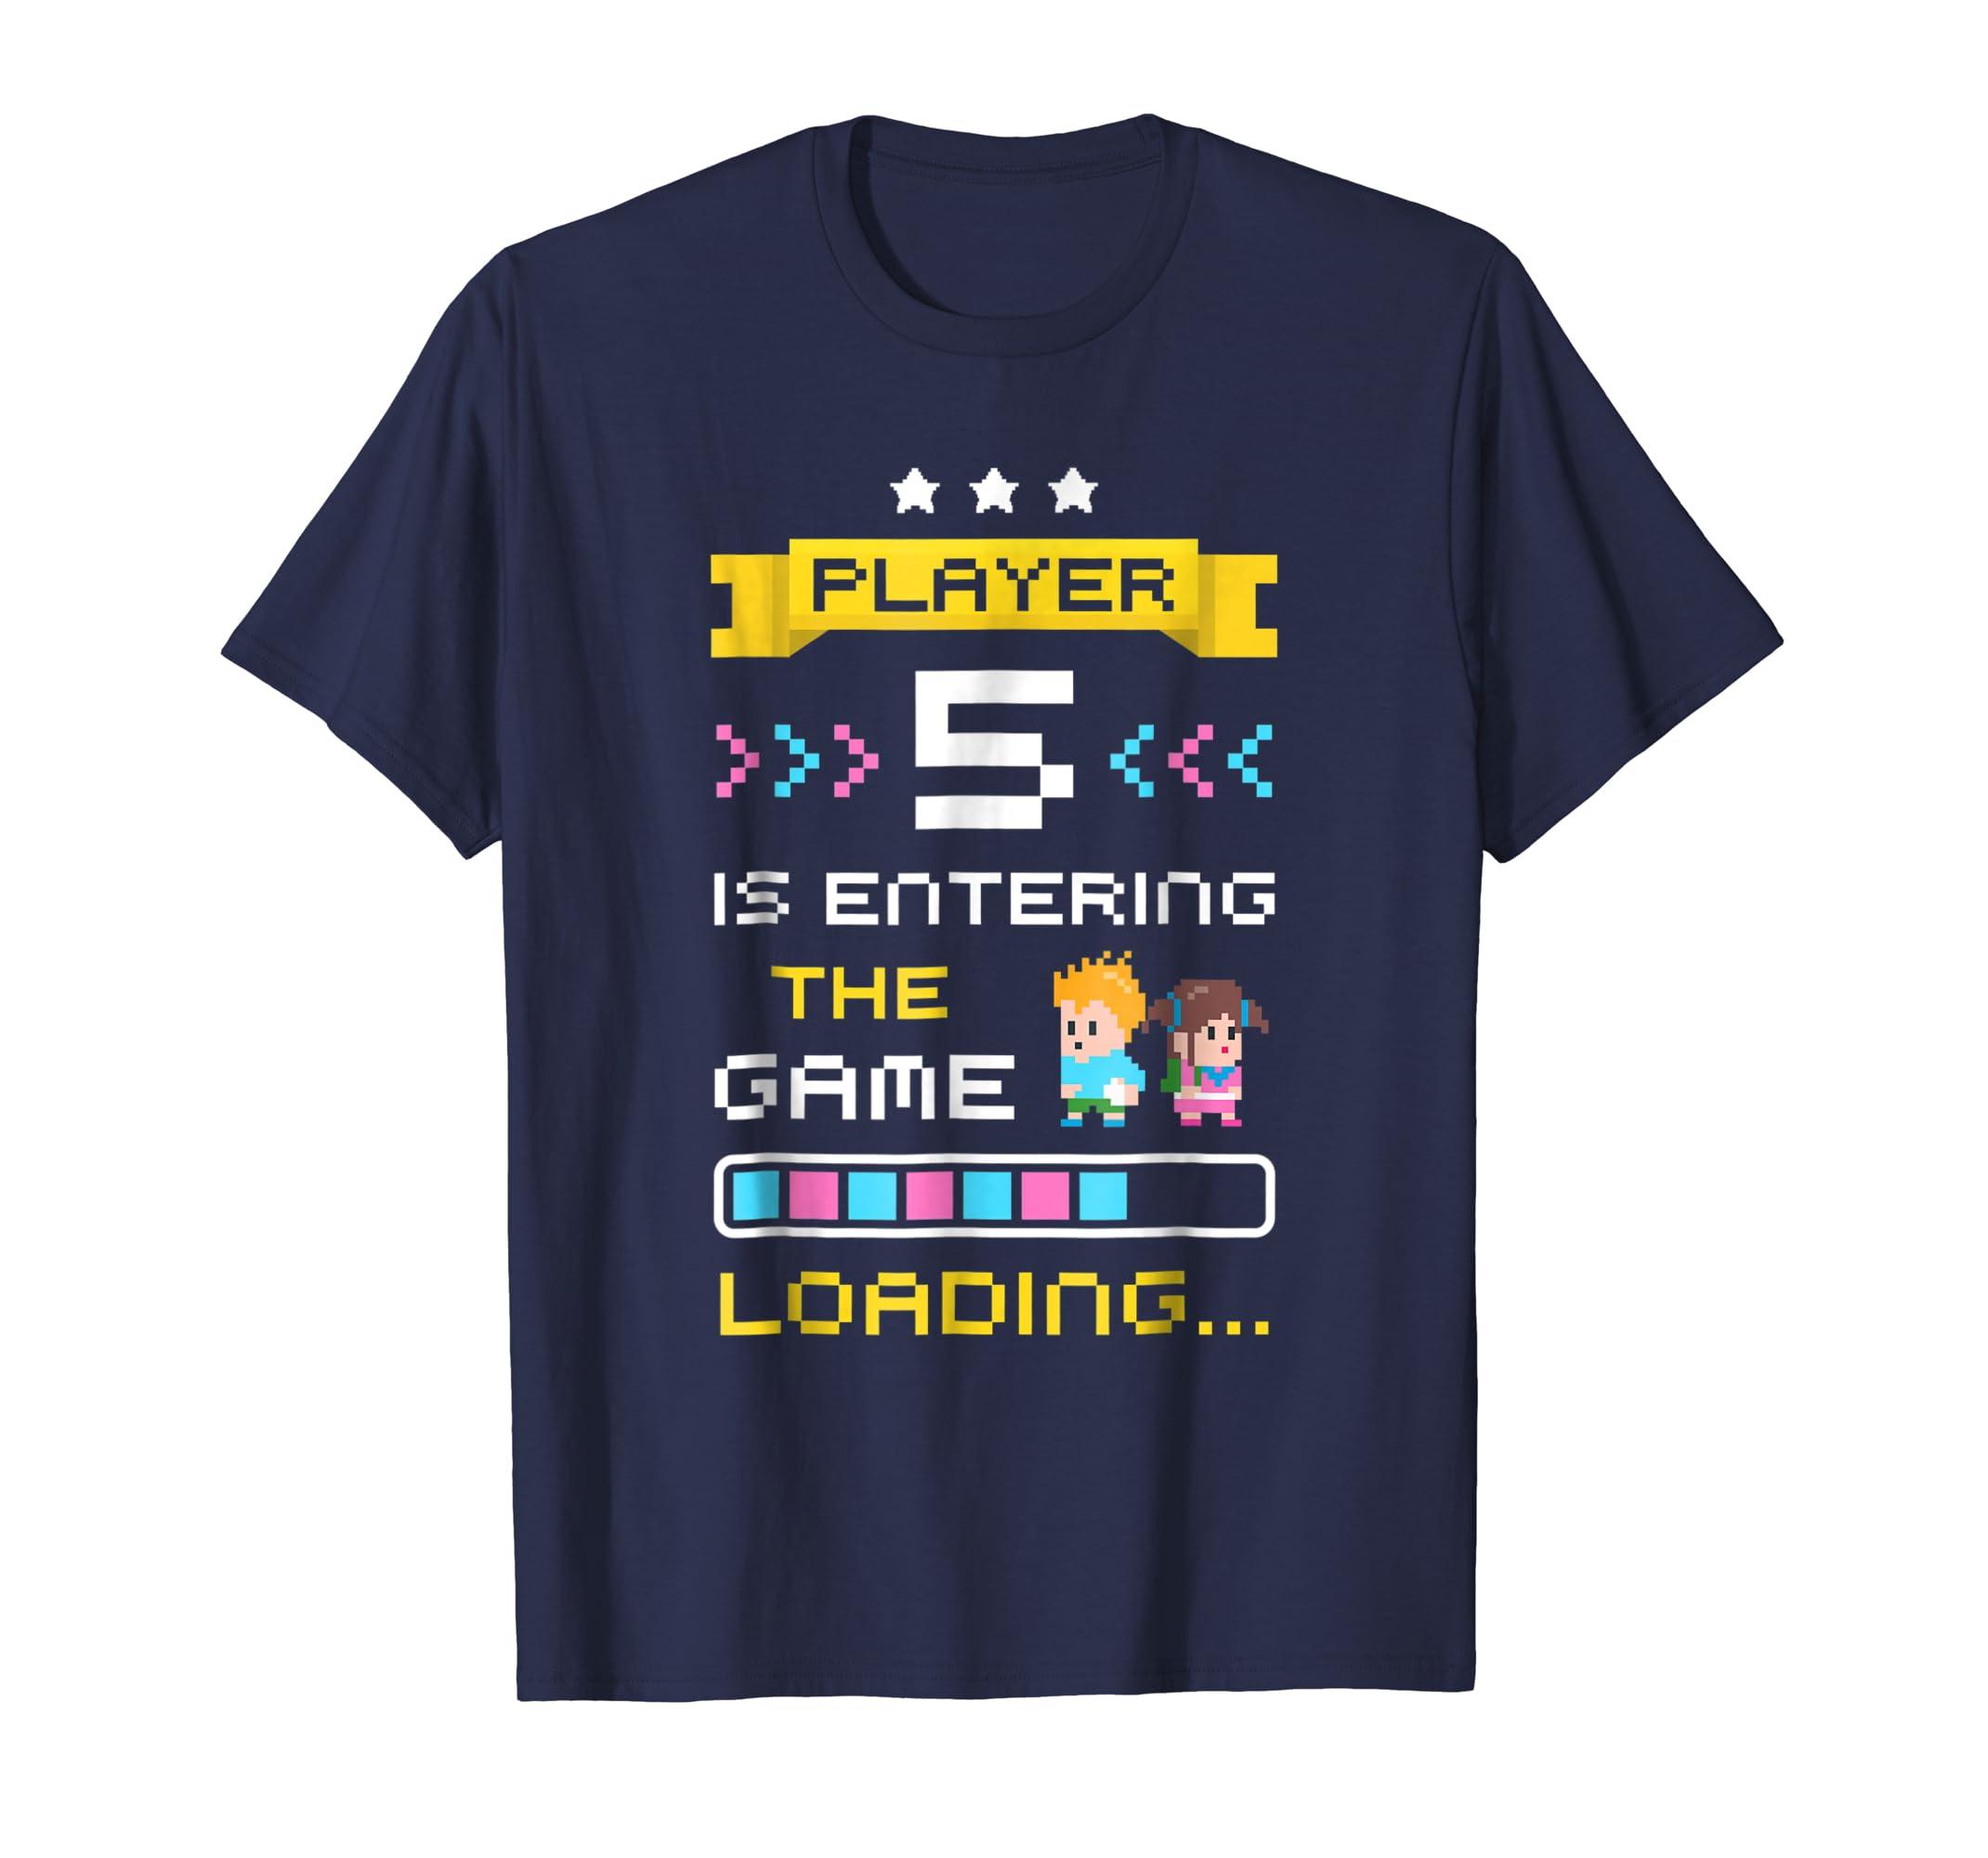 3rd Time Gamer Dad Mom Pregnancy Announcement Shirt Player 5-ln